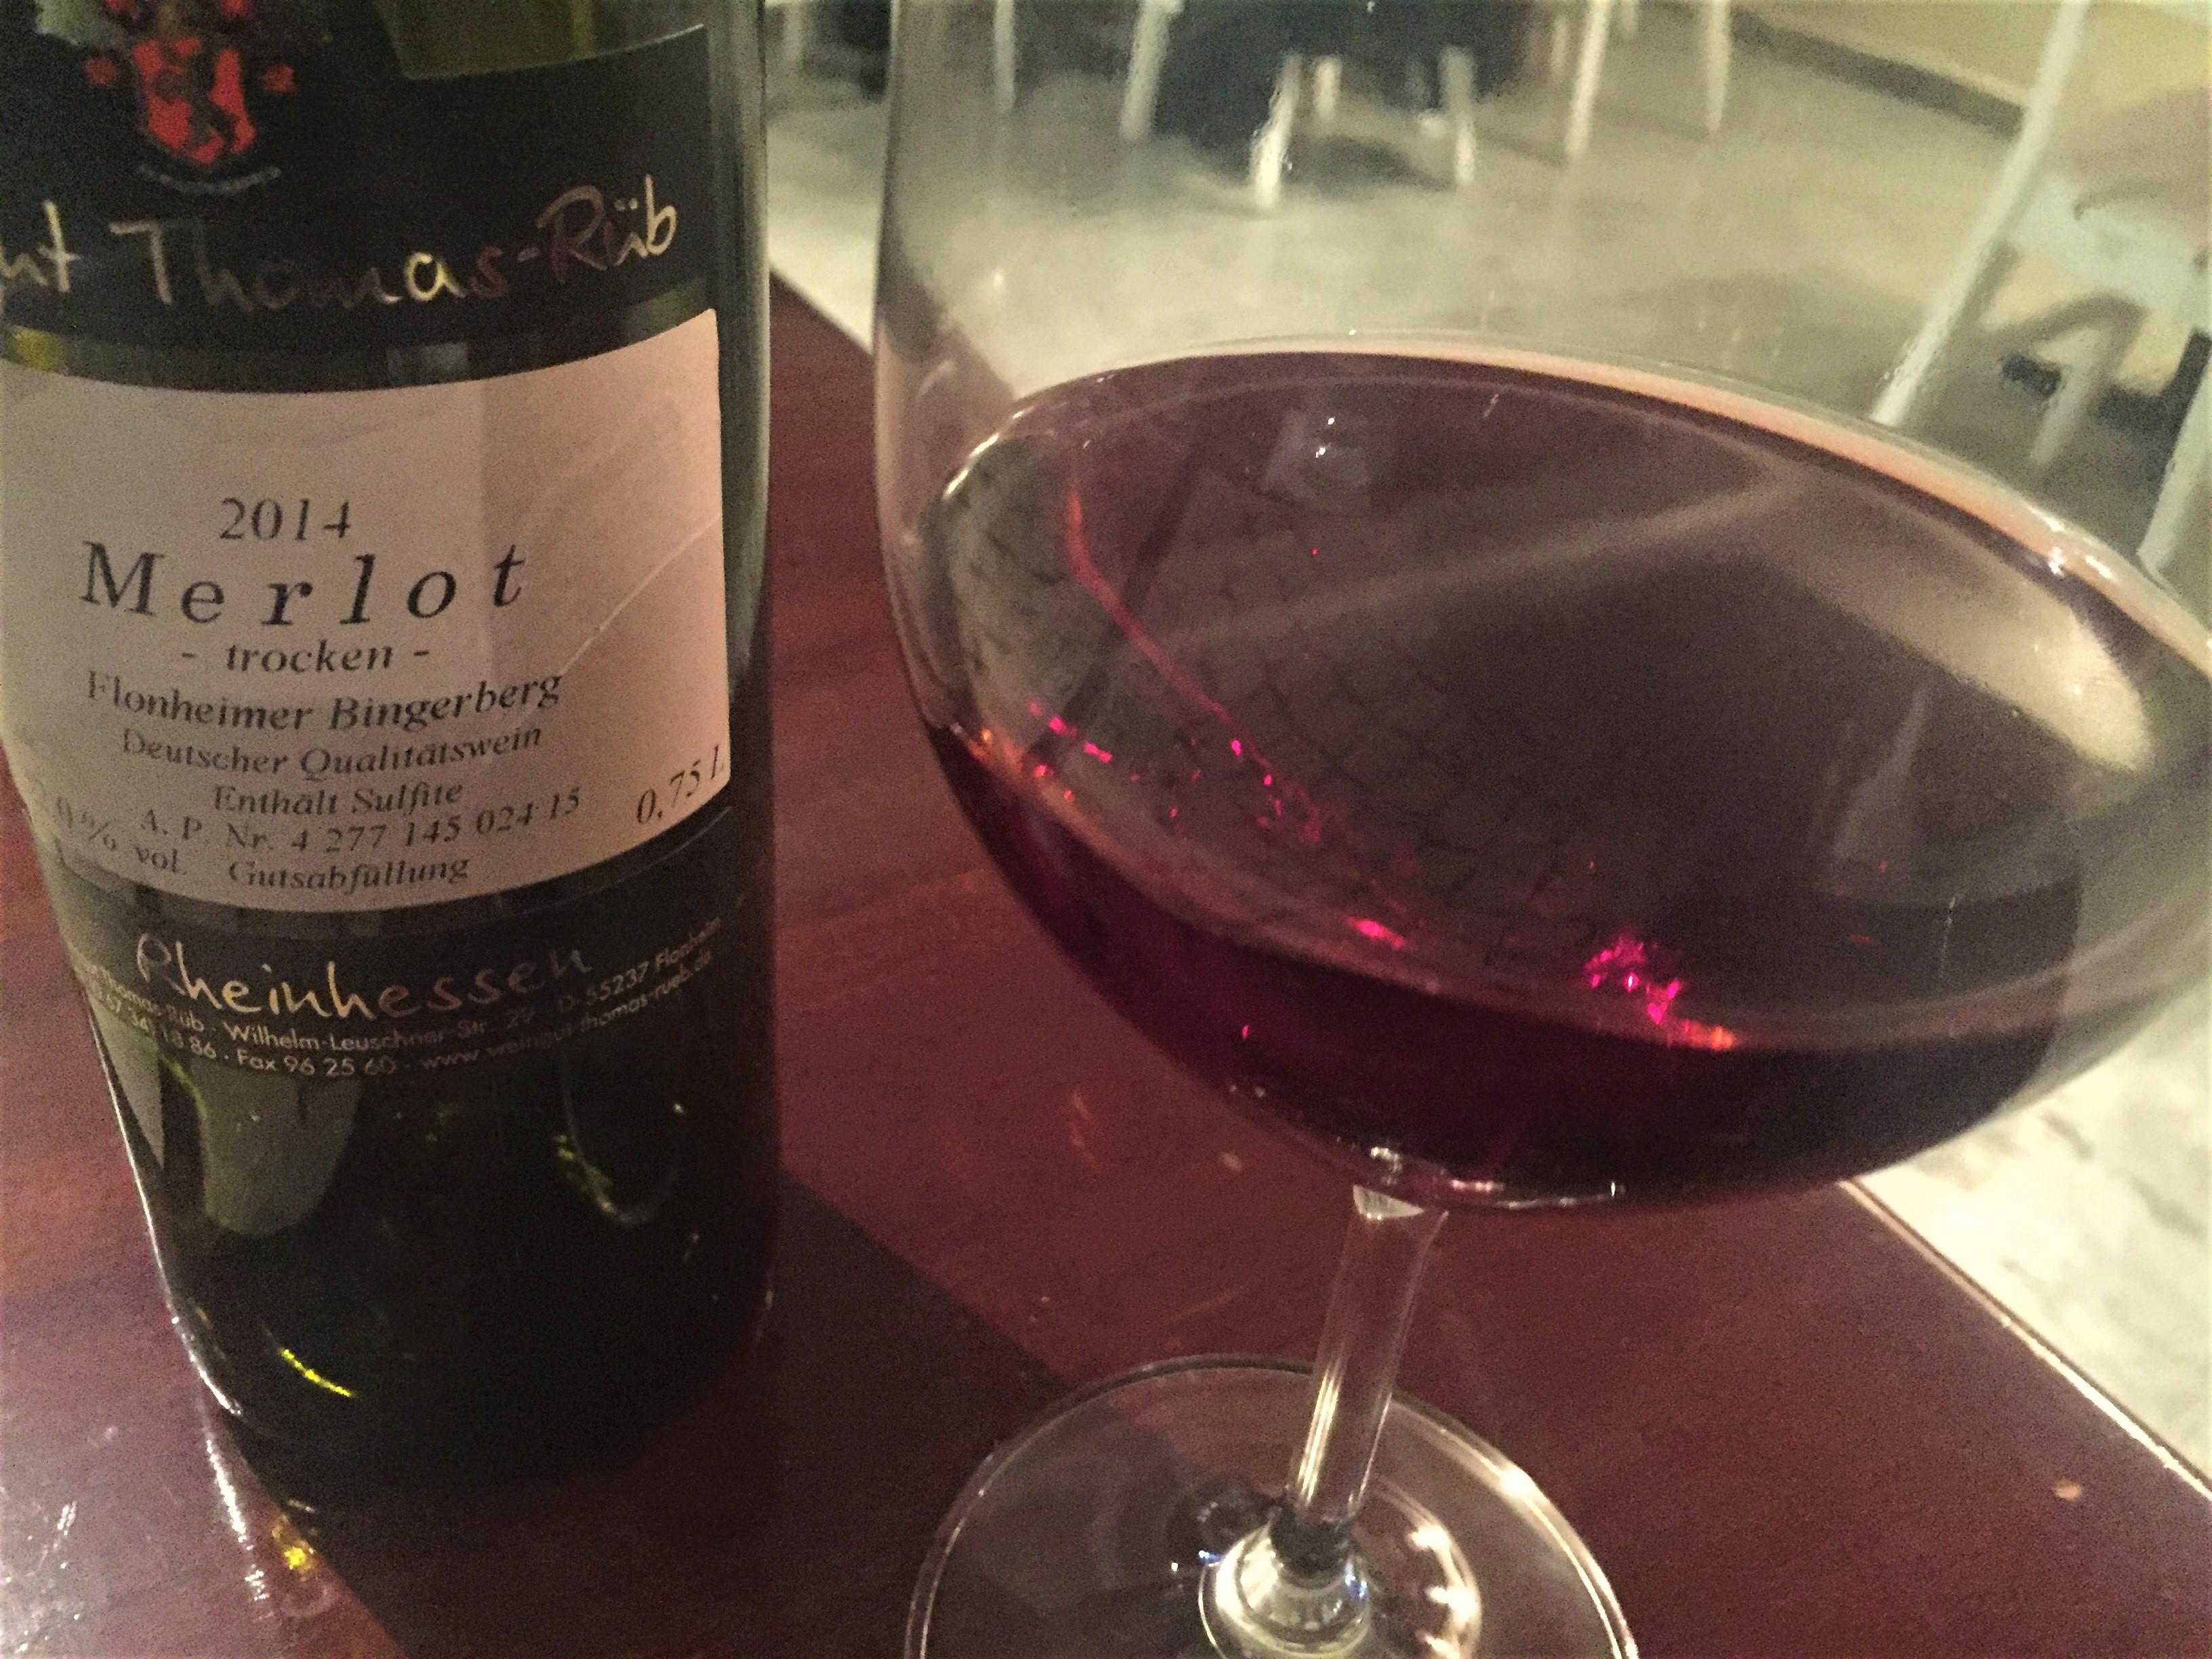 Weingut Thomas Rub Weinkeller Merlot